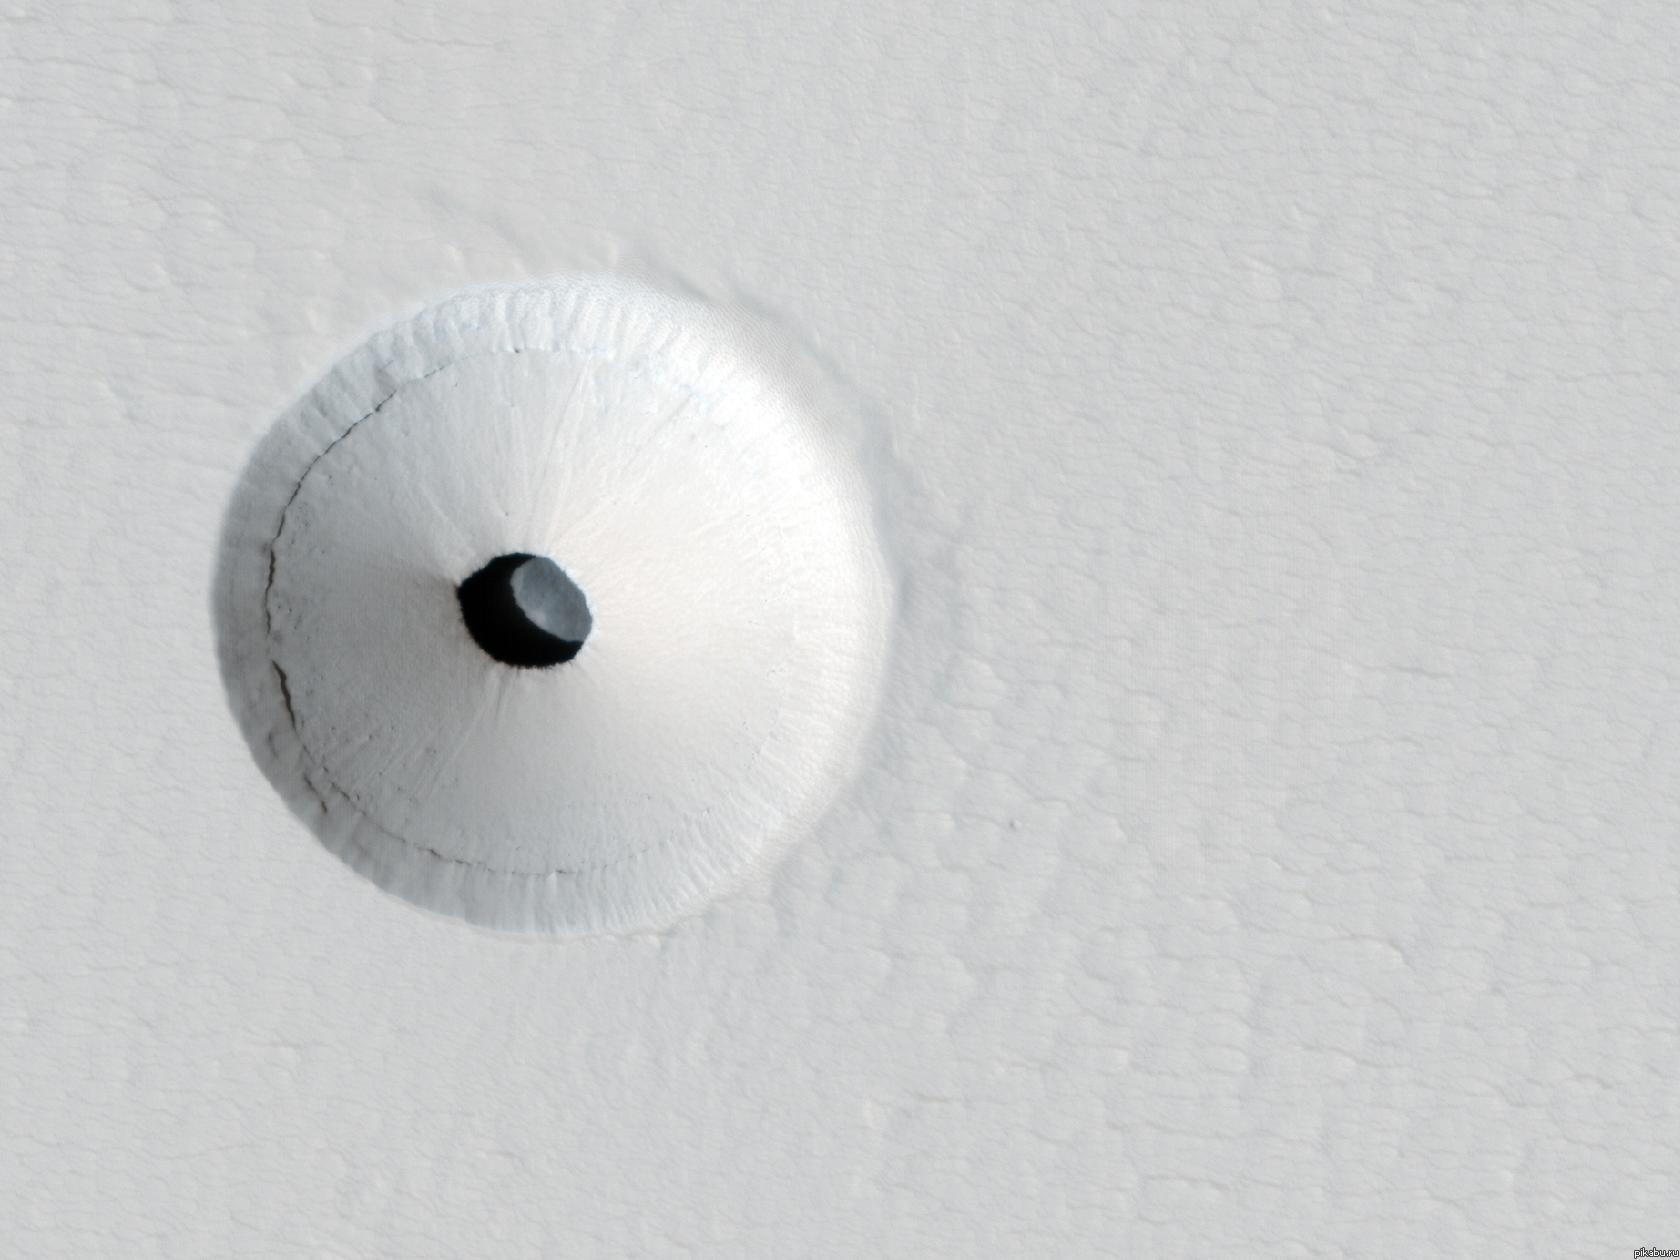 Дыра на Марсе стала виднее (3 фото)